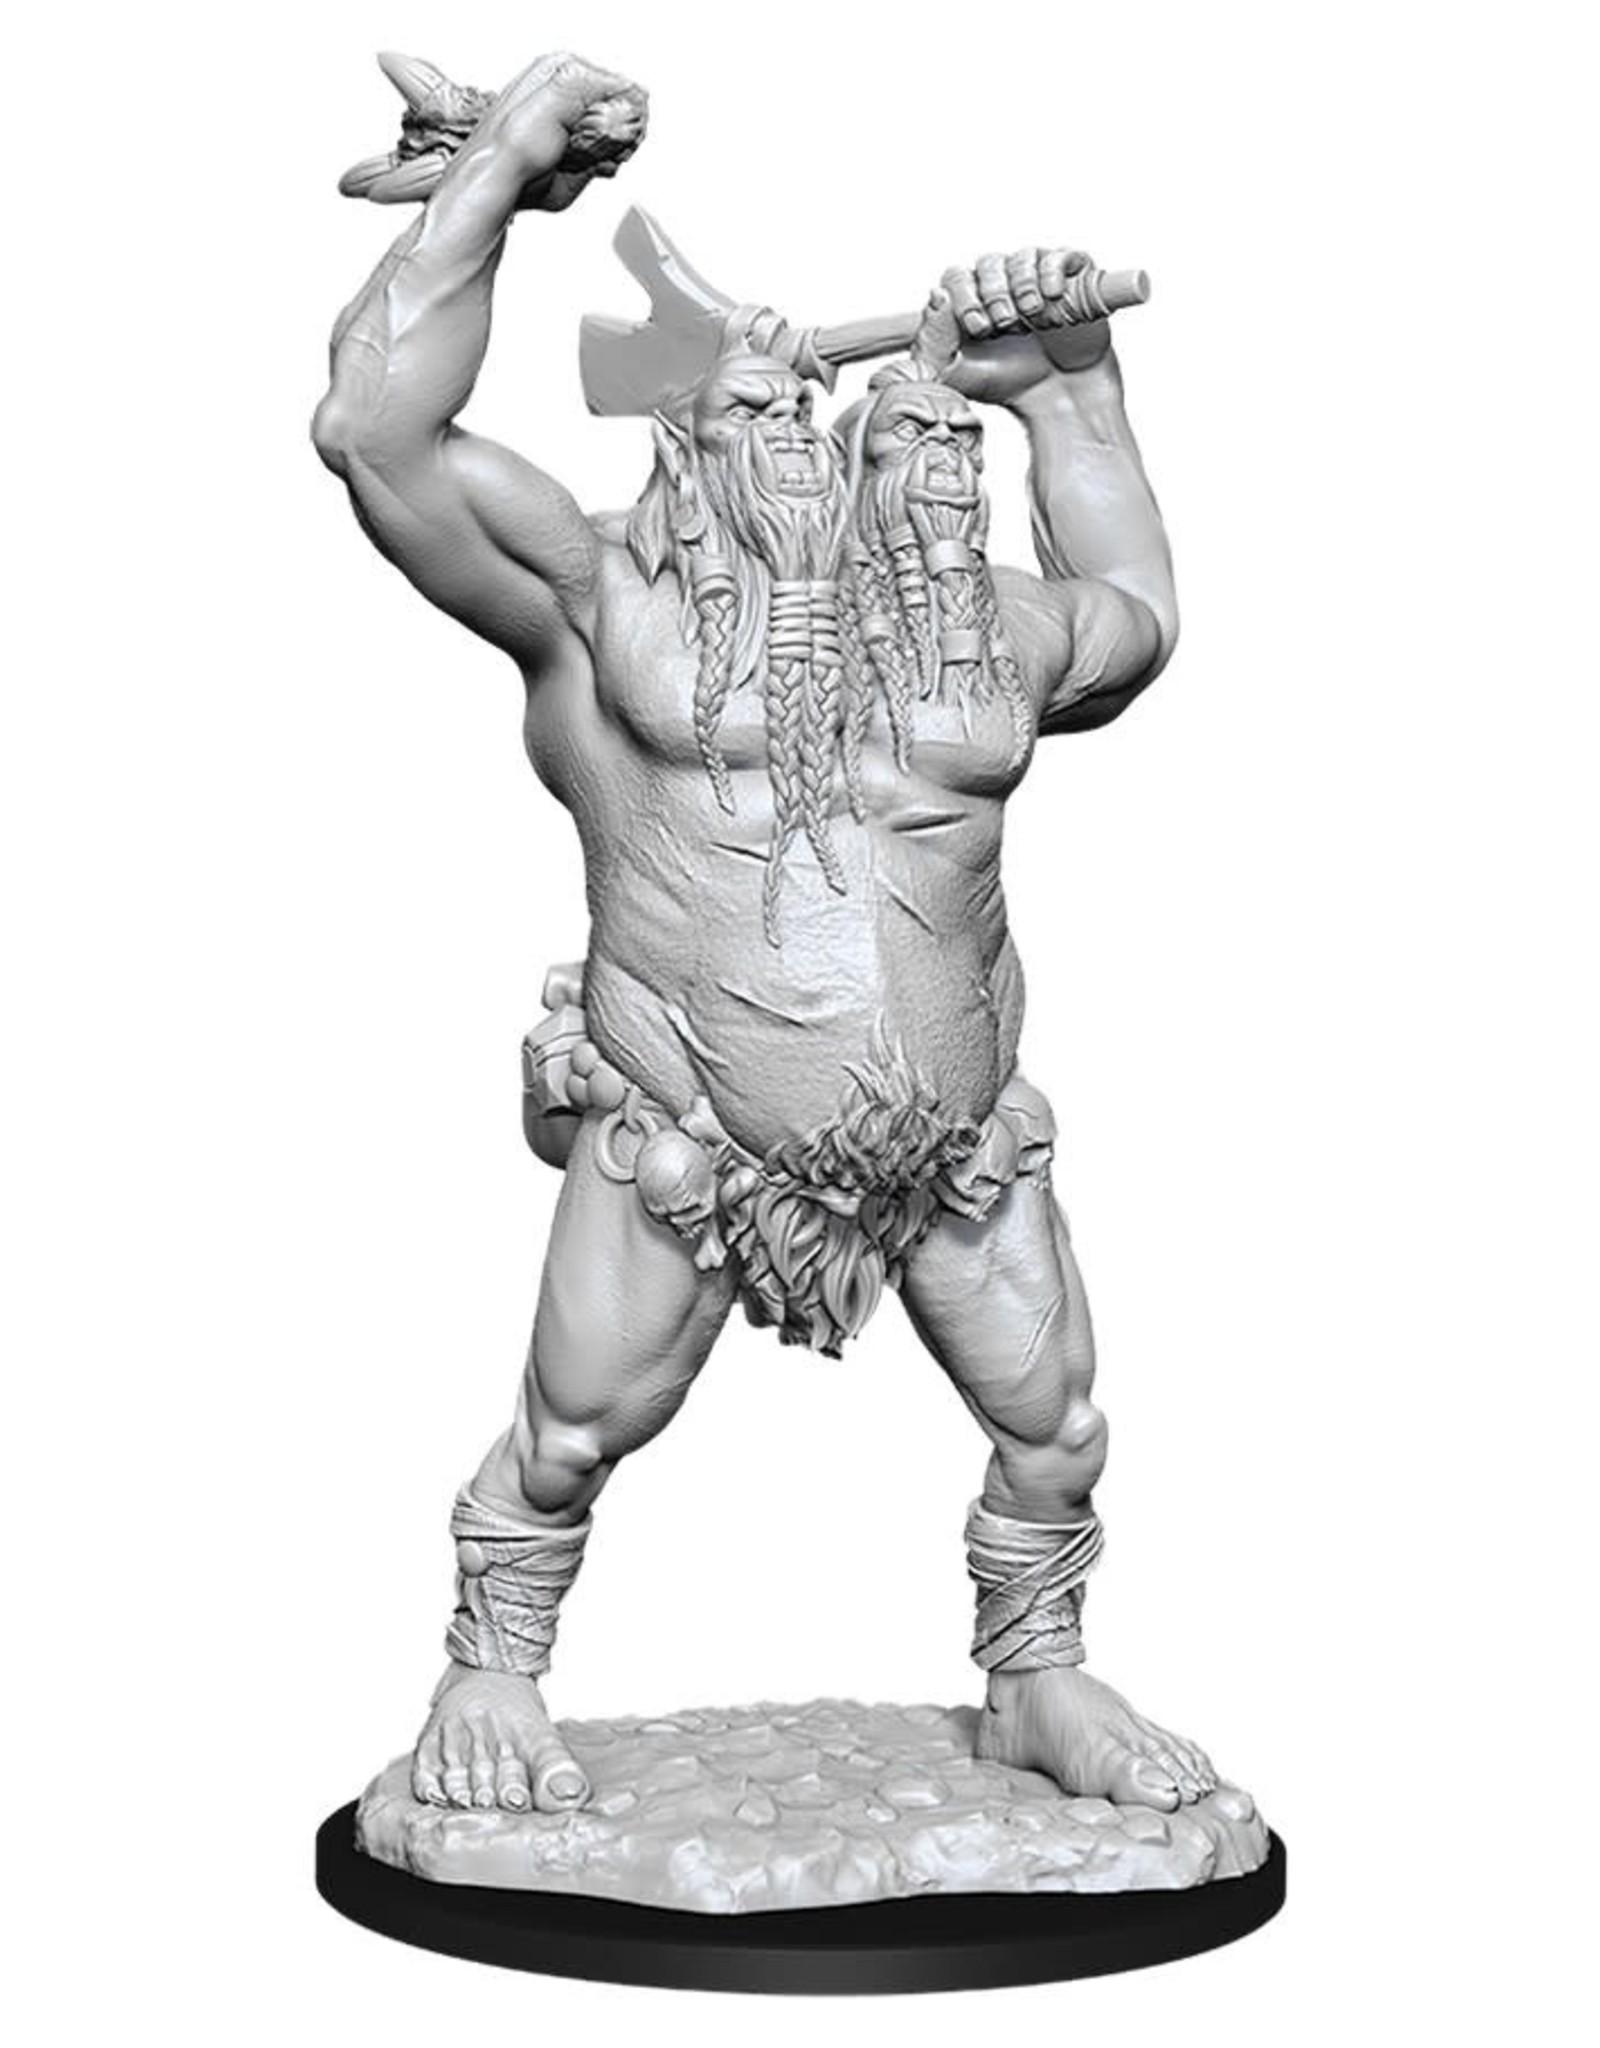 WizKids Dungeons & Dragons Nolzur's Marvelous Miniatures: Ettin